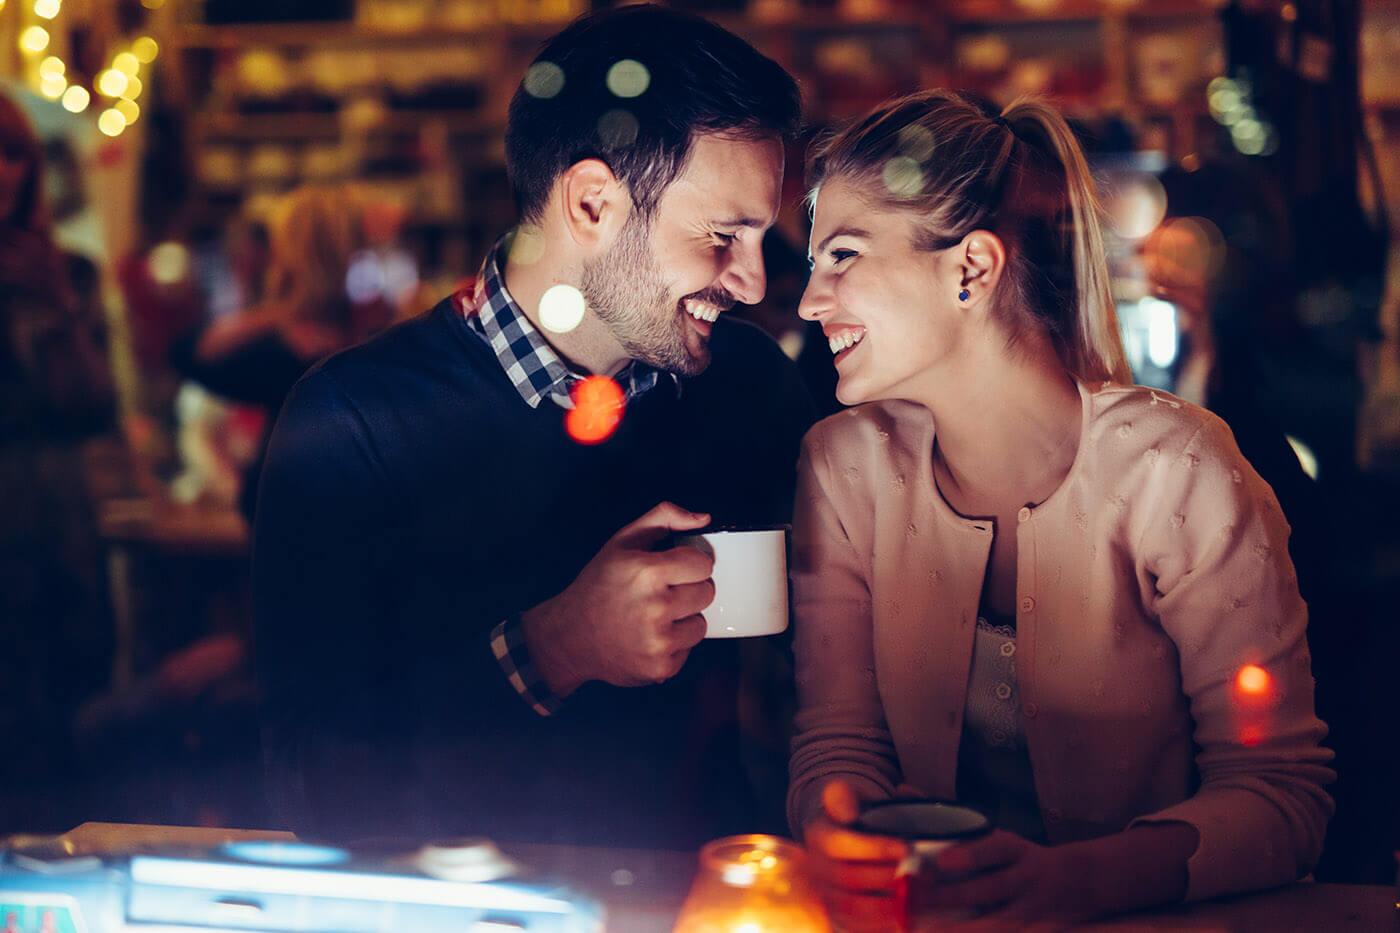 schaebens-zweisamkeit-date-ideen-romantik